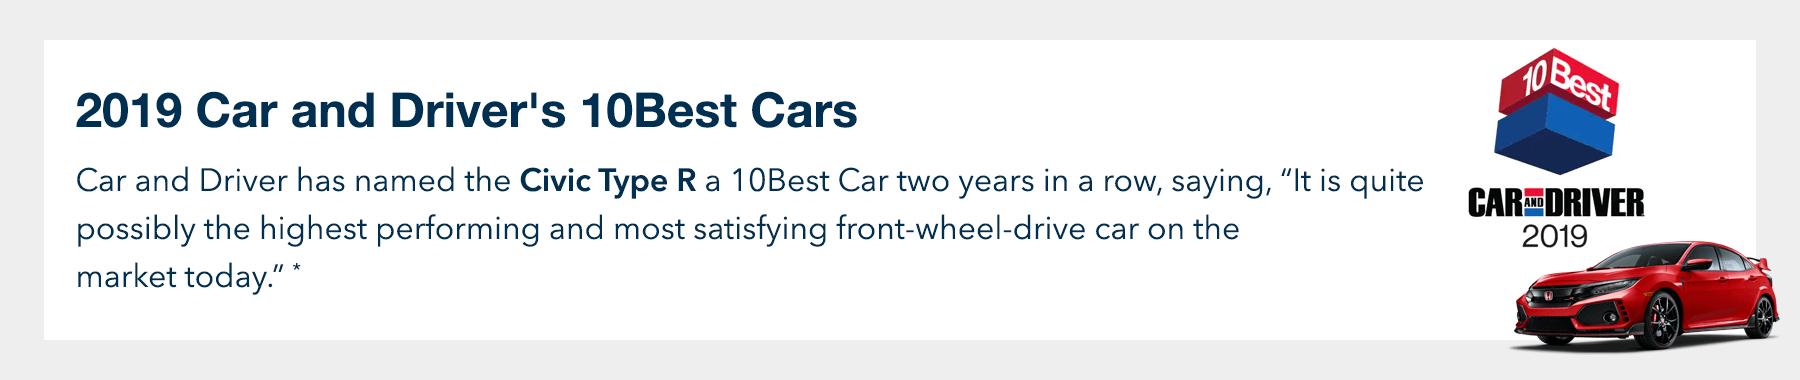 2019 Honda Civic Type R Car and Driver 10Best Award Slider